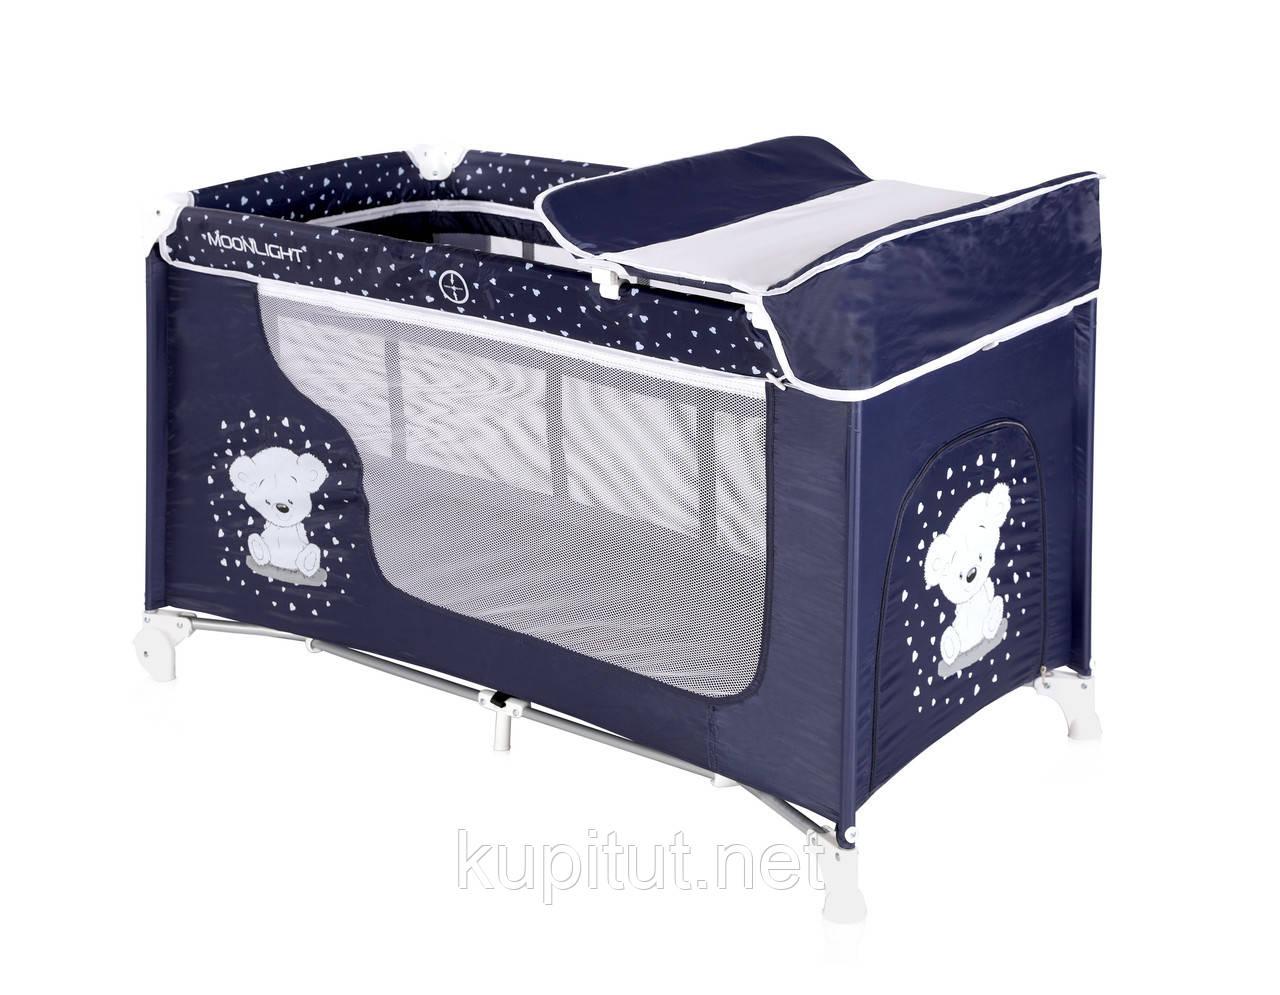 Кровать-манеж Lorelli Moomlight 2